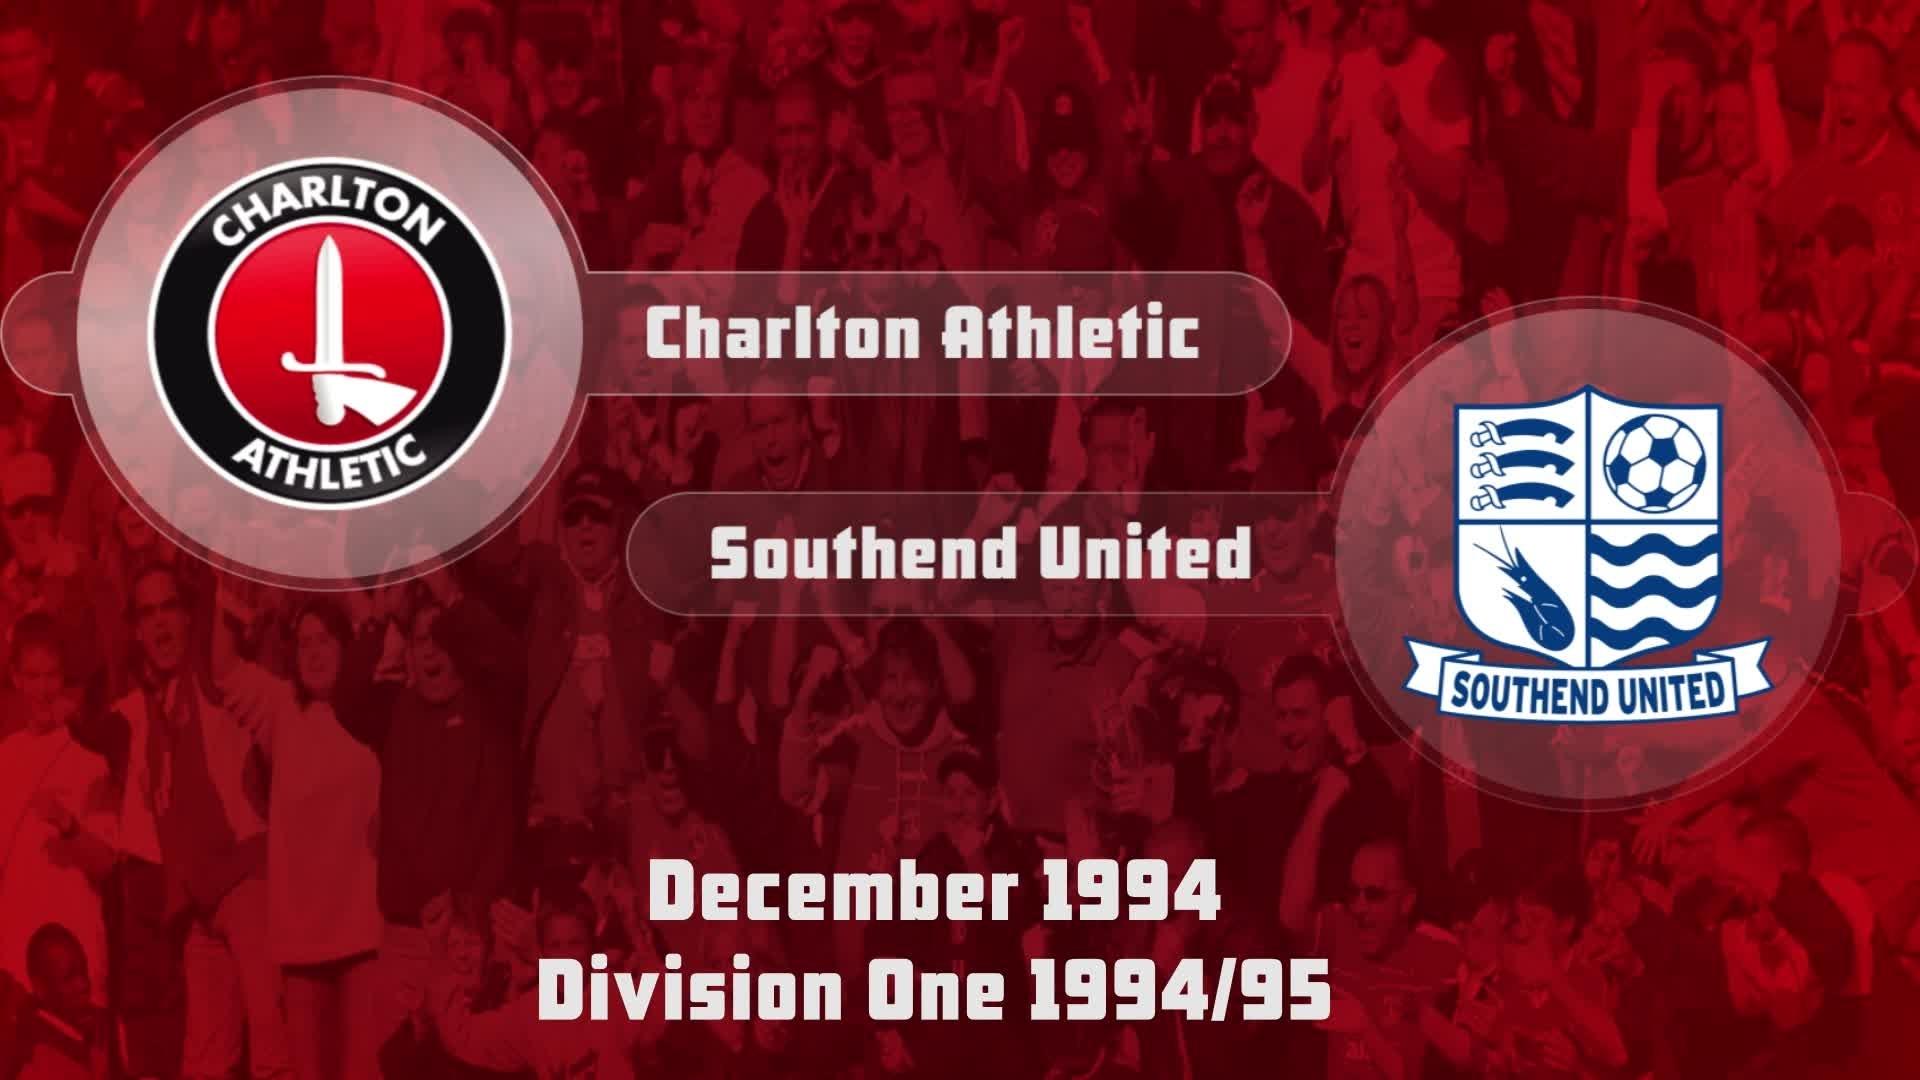 24 HIGHLIGHTS | Charlton 3 Southend 1 (Dec 1994)